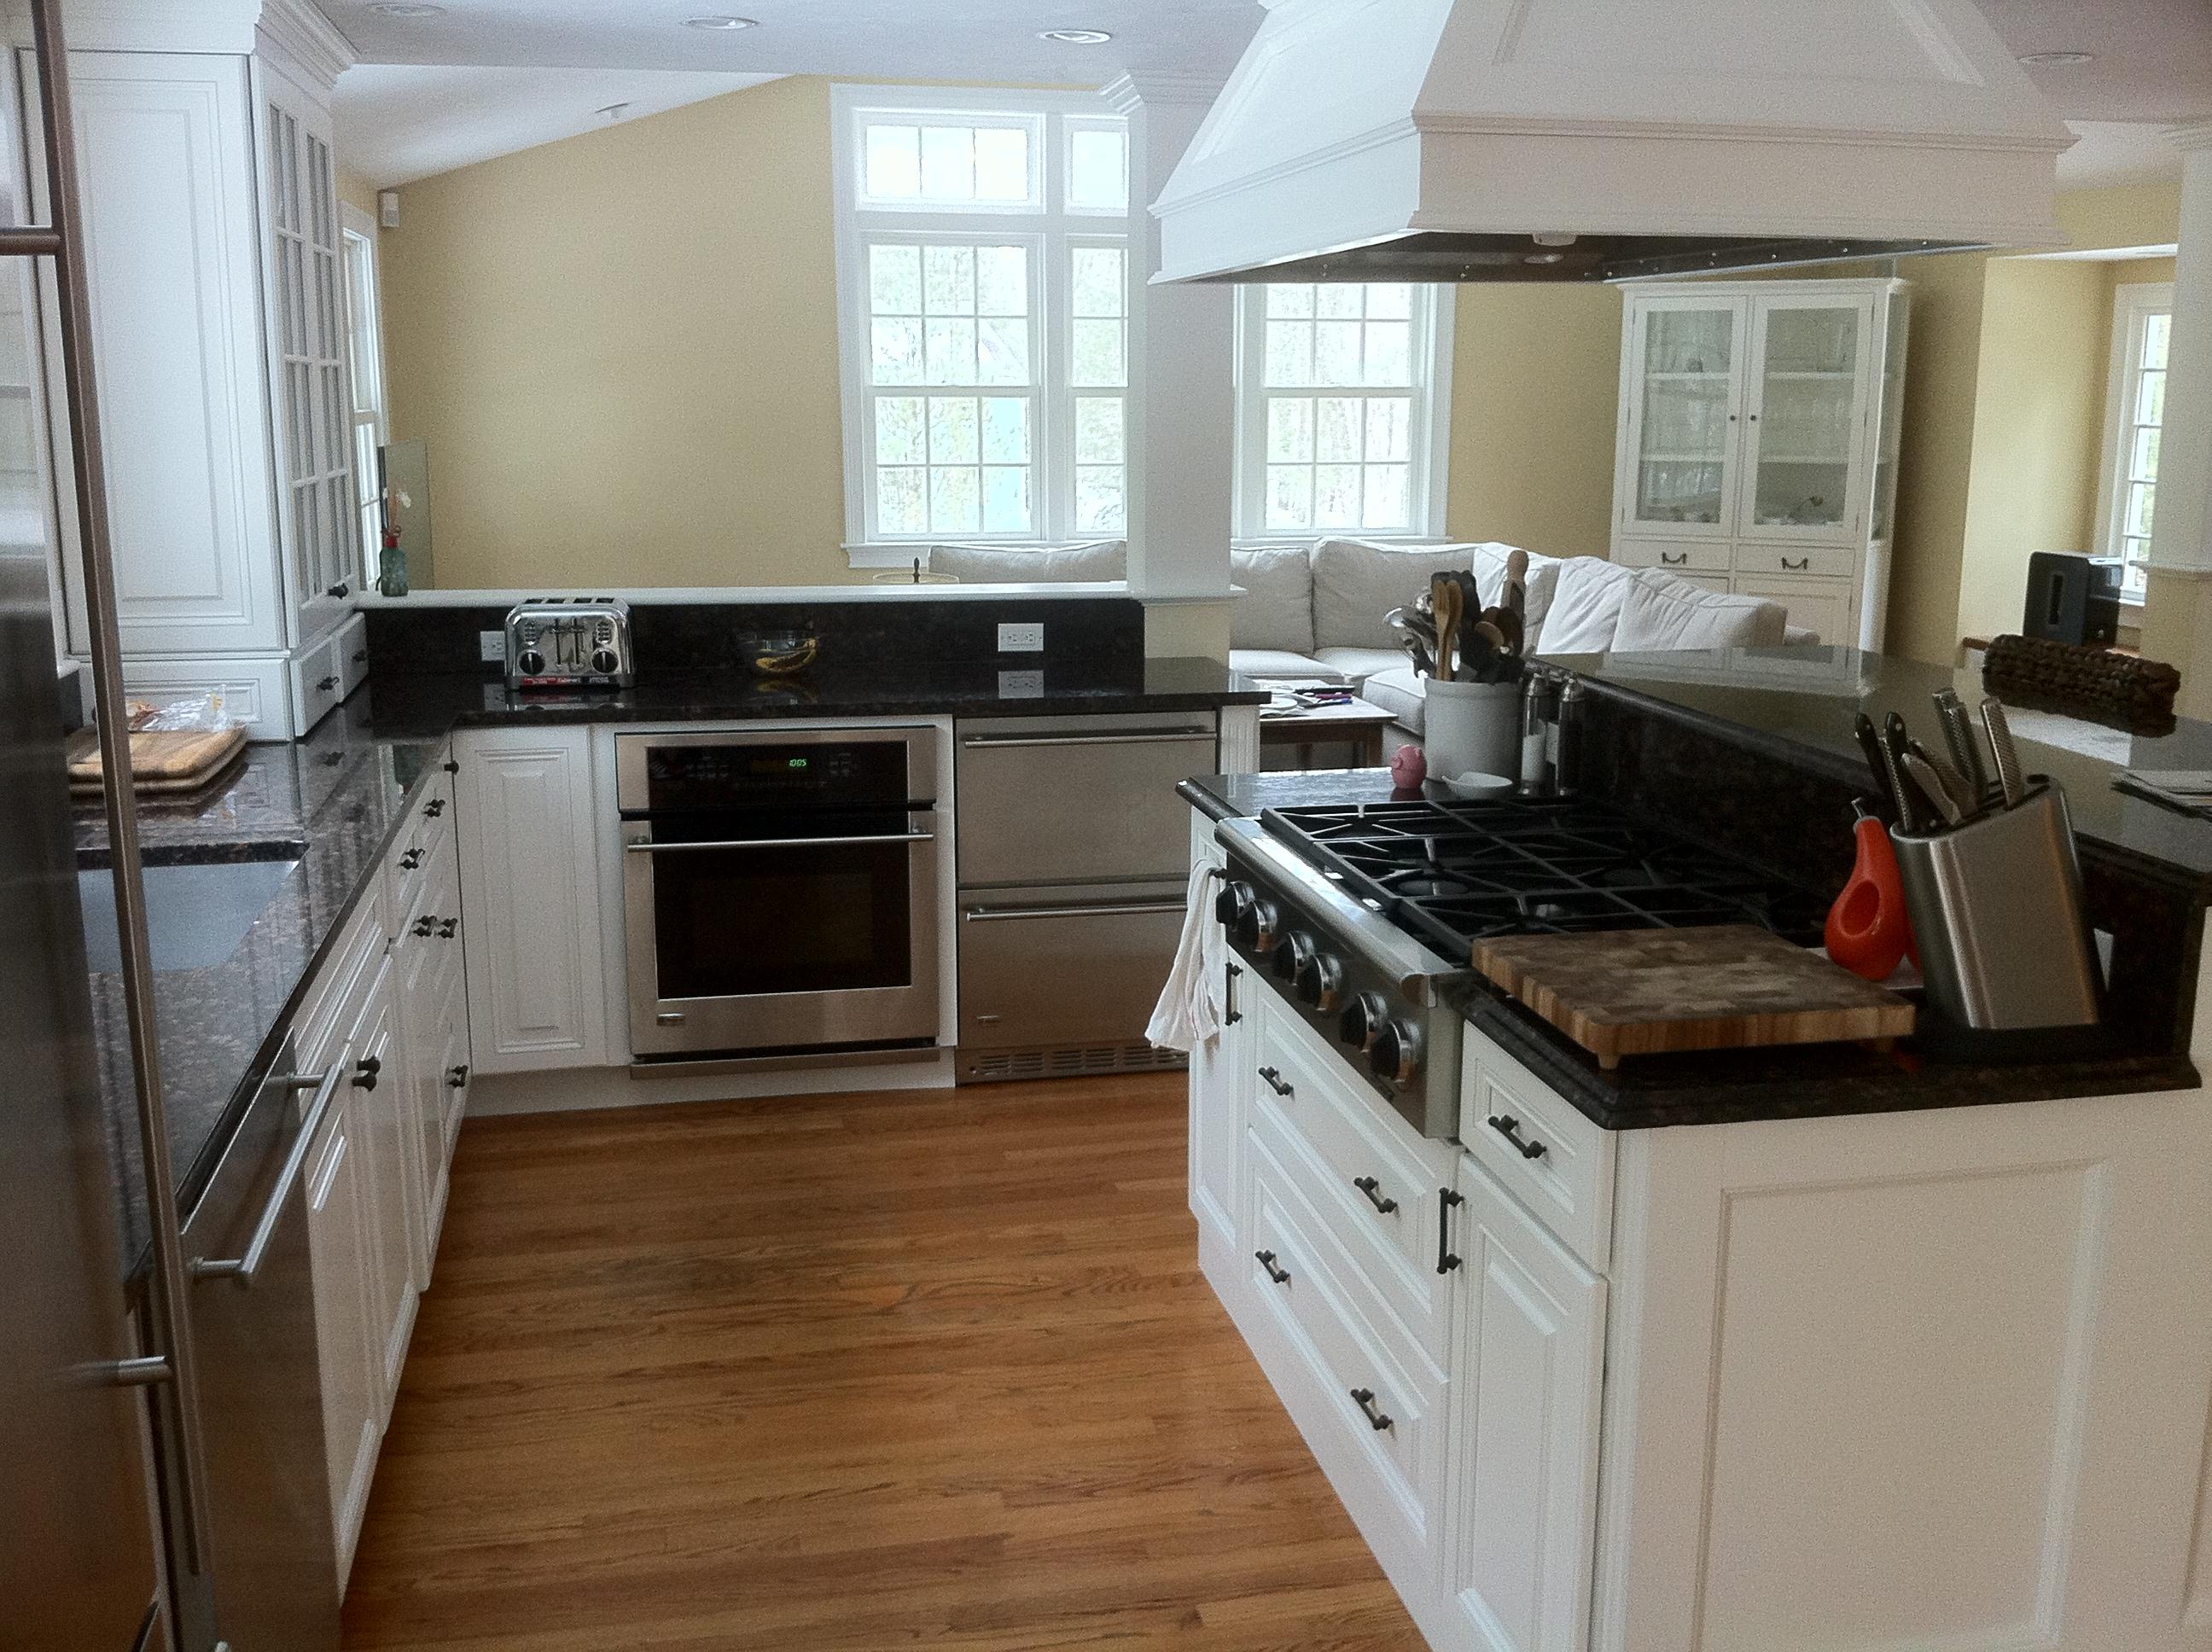 Cabinet Refinishing & Kitchen Remodeling in Rhode Island RI ...